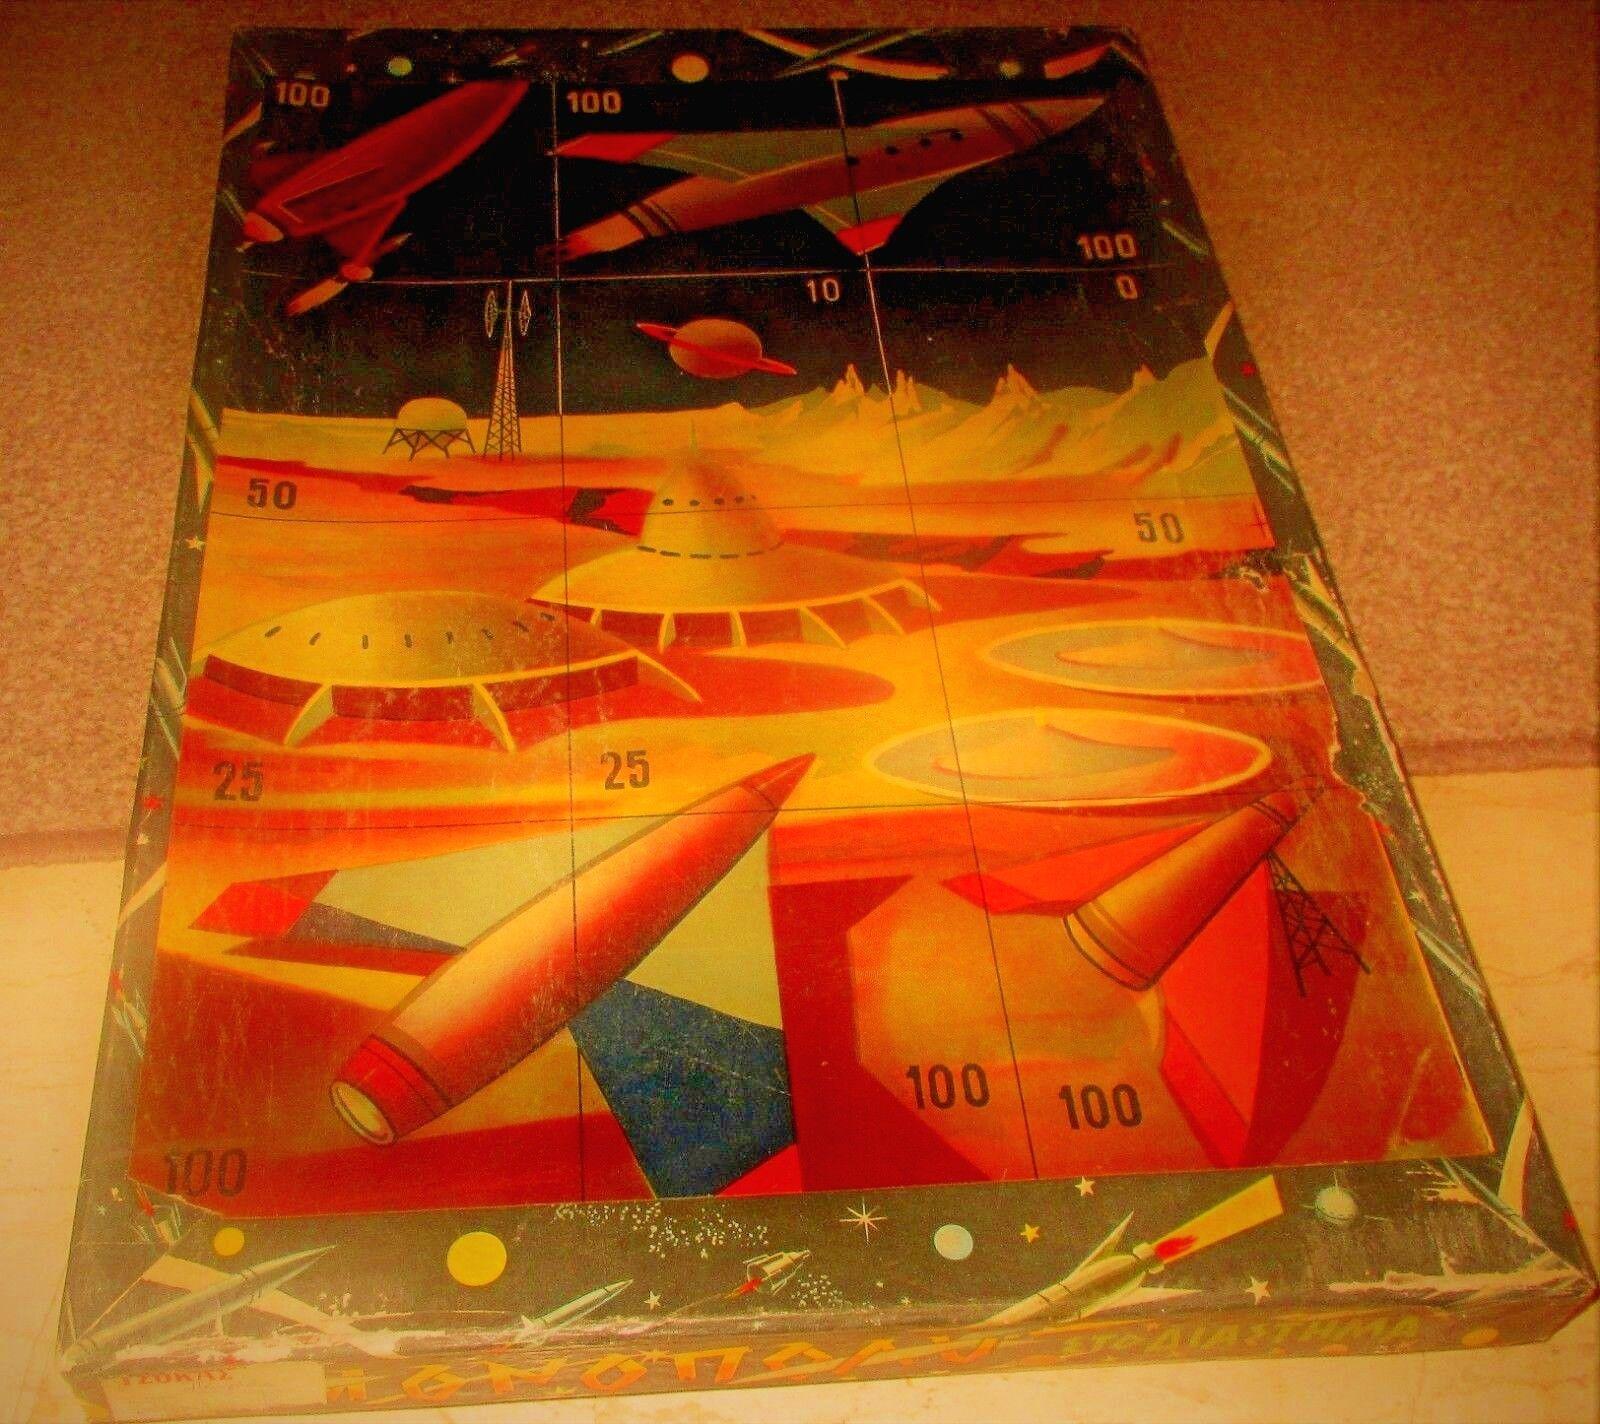 UNIQUE VINTAGE GREEK LITHO HARDBOARD - SPACE MONOPOLY - BOARD GAME